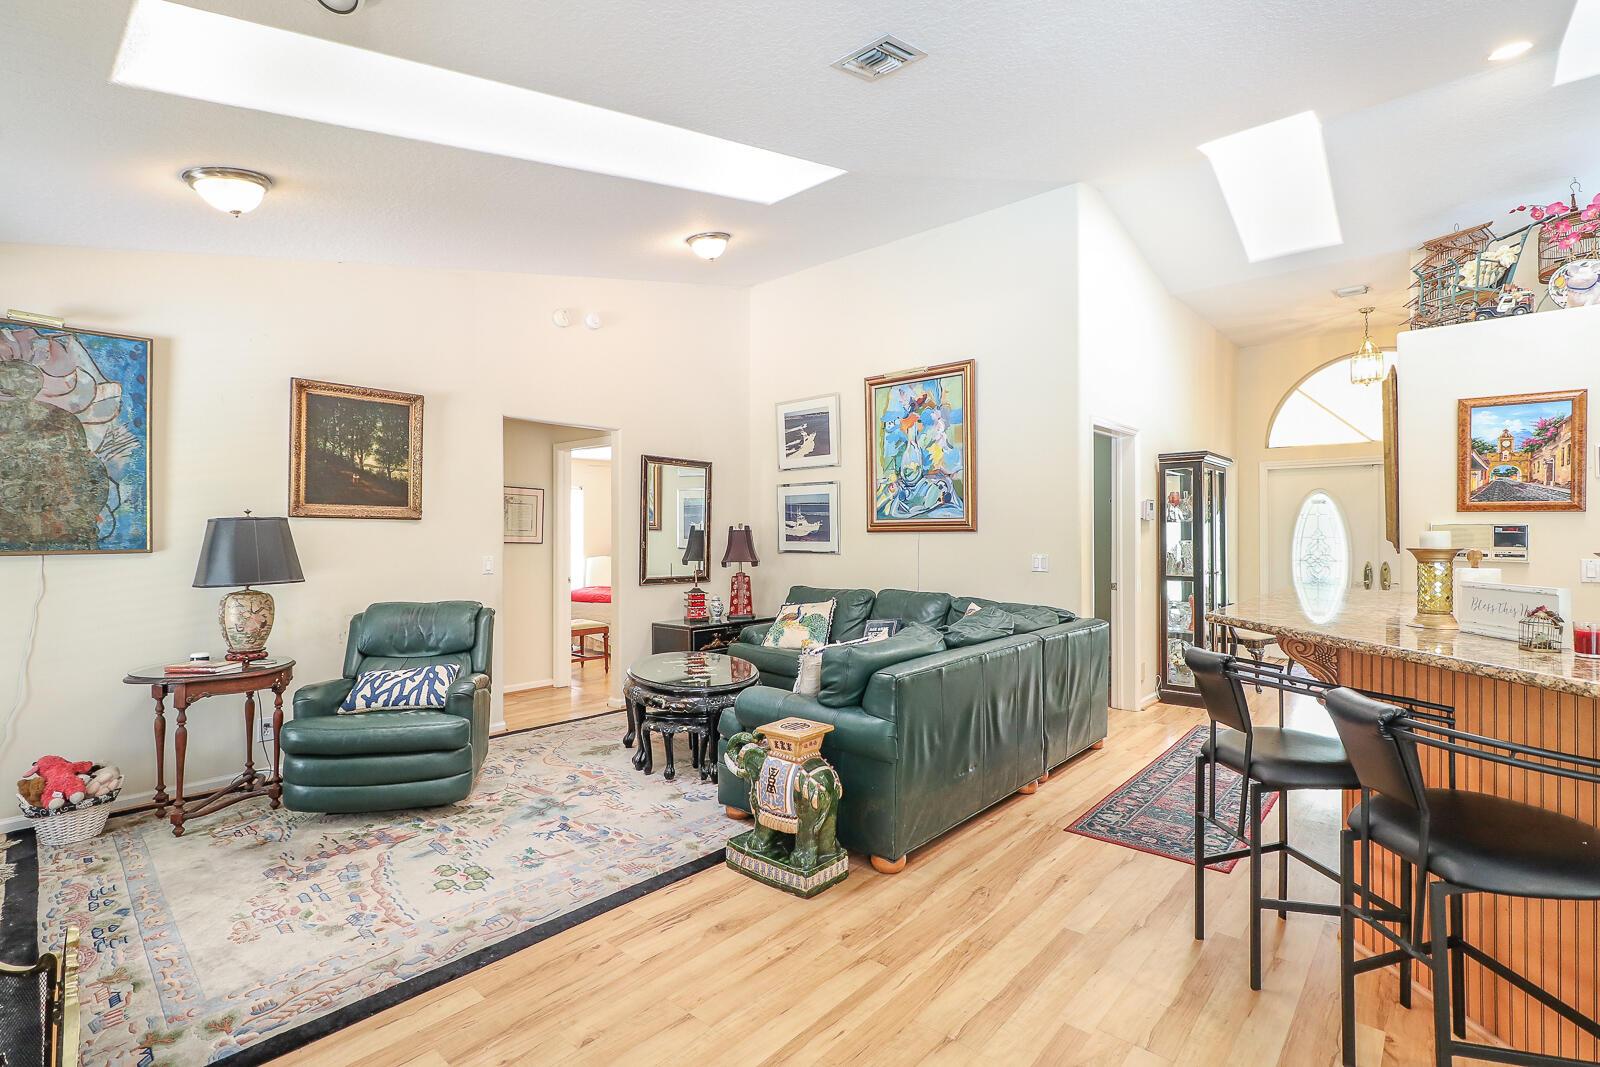 15-Family Room